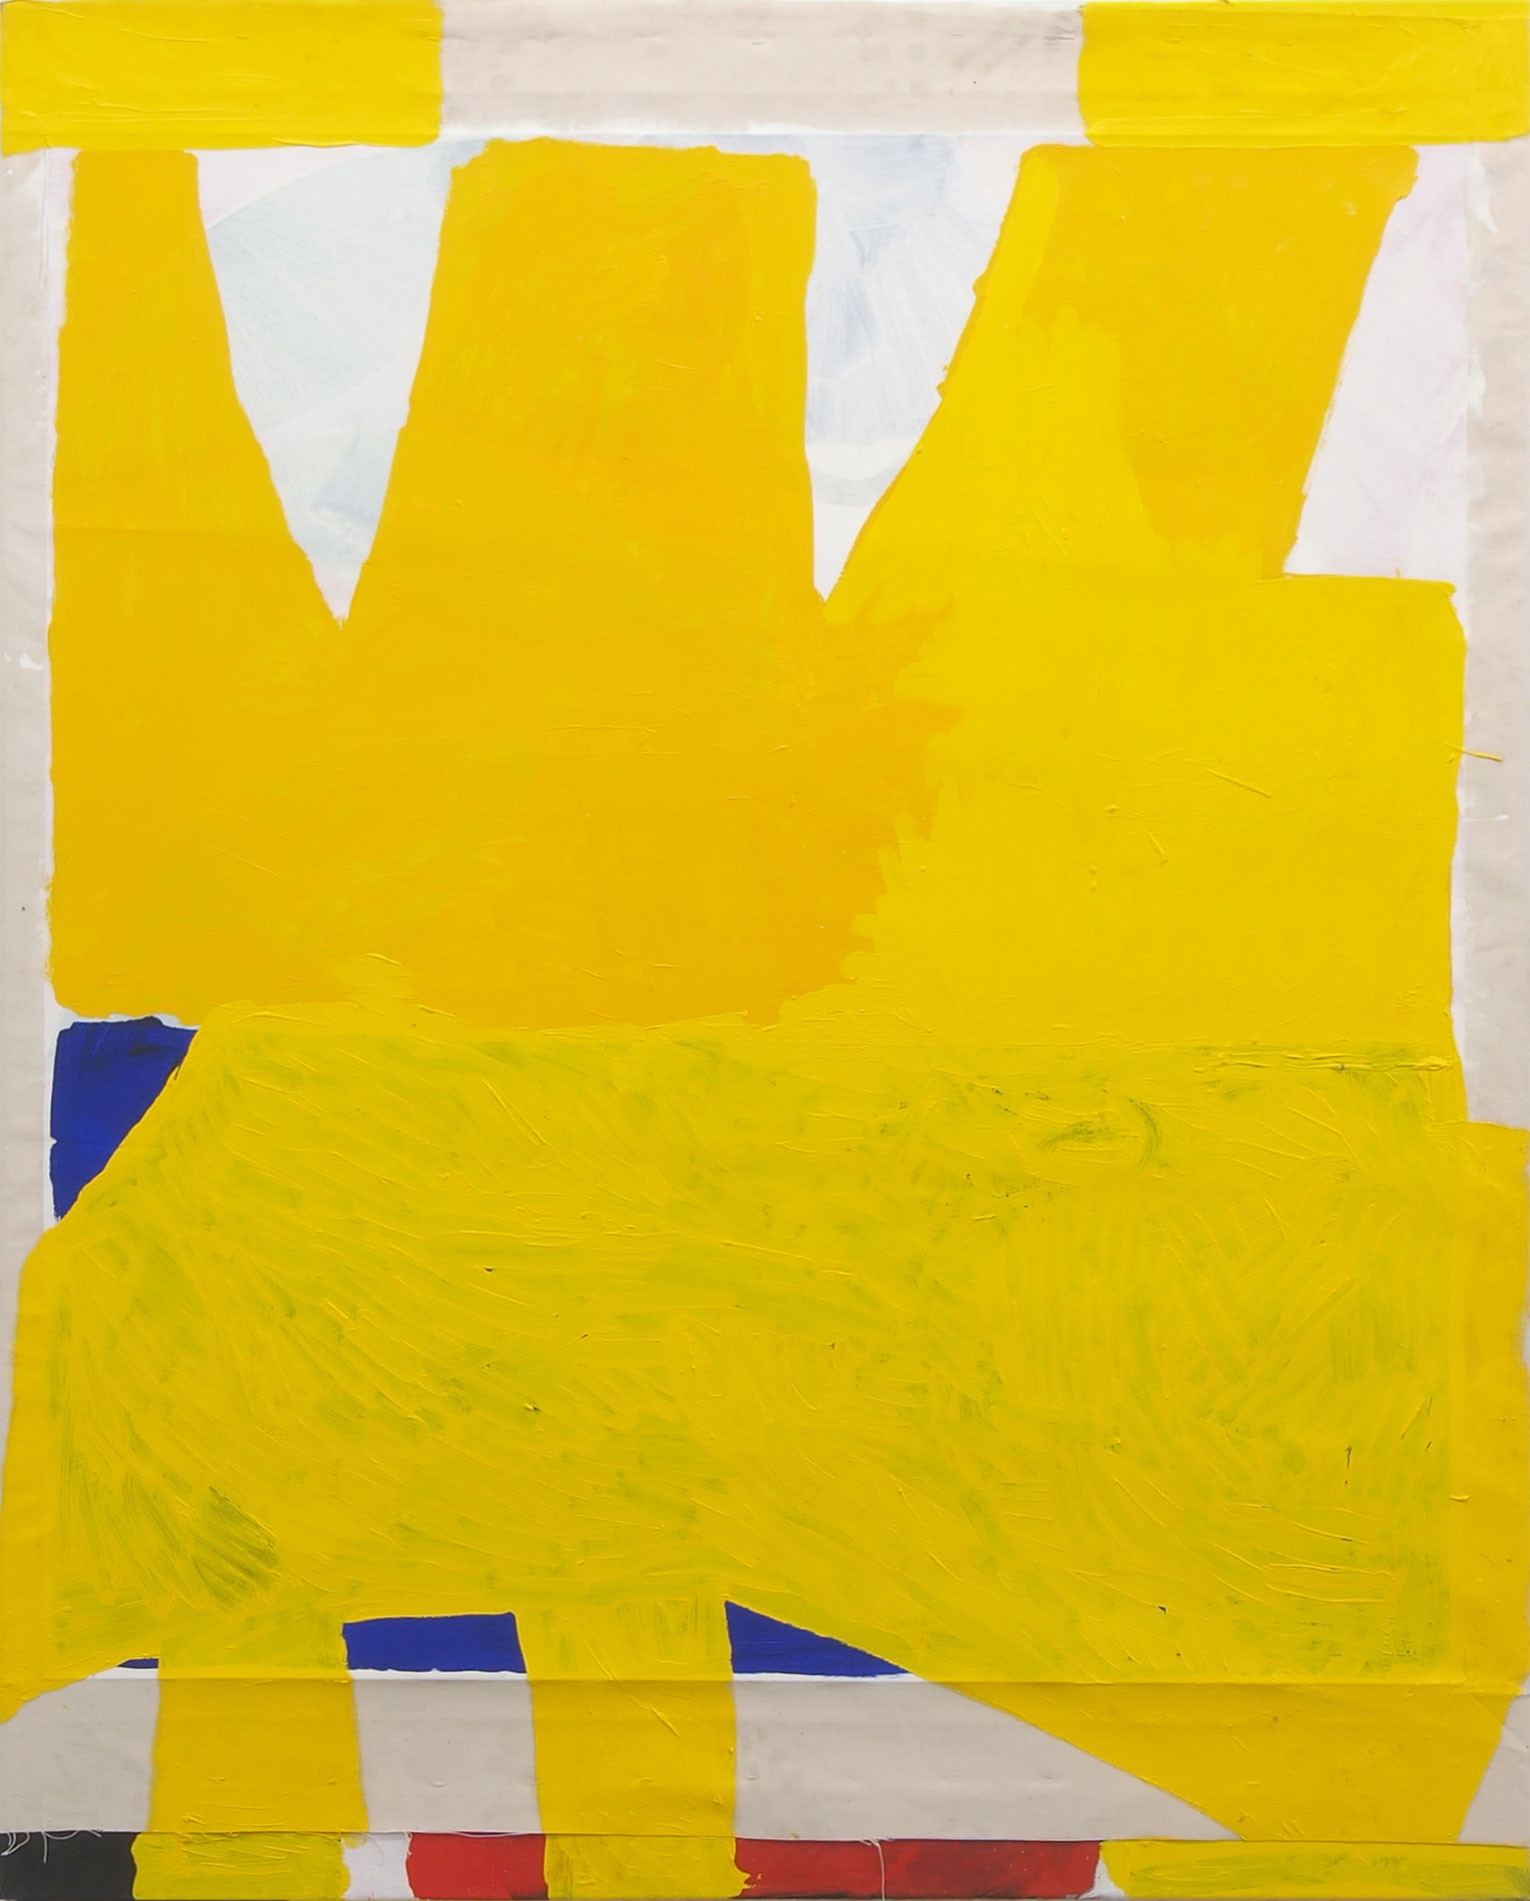 <b>Title:</b>Yellow Painting<br /><b>Year:</b>2017<br /><b>Medium:</b>Oil on collaged canvas<br /><b>Size:</b>150 x 120 cm